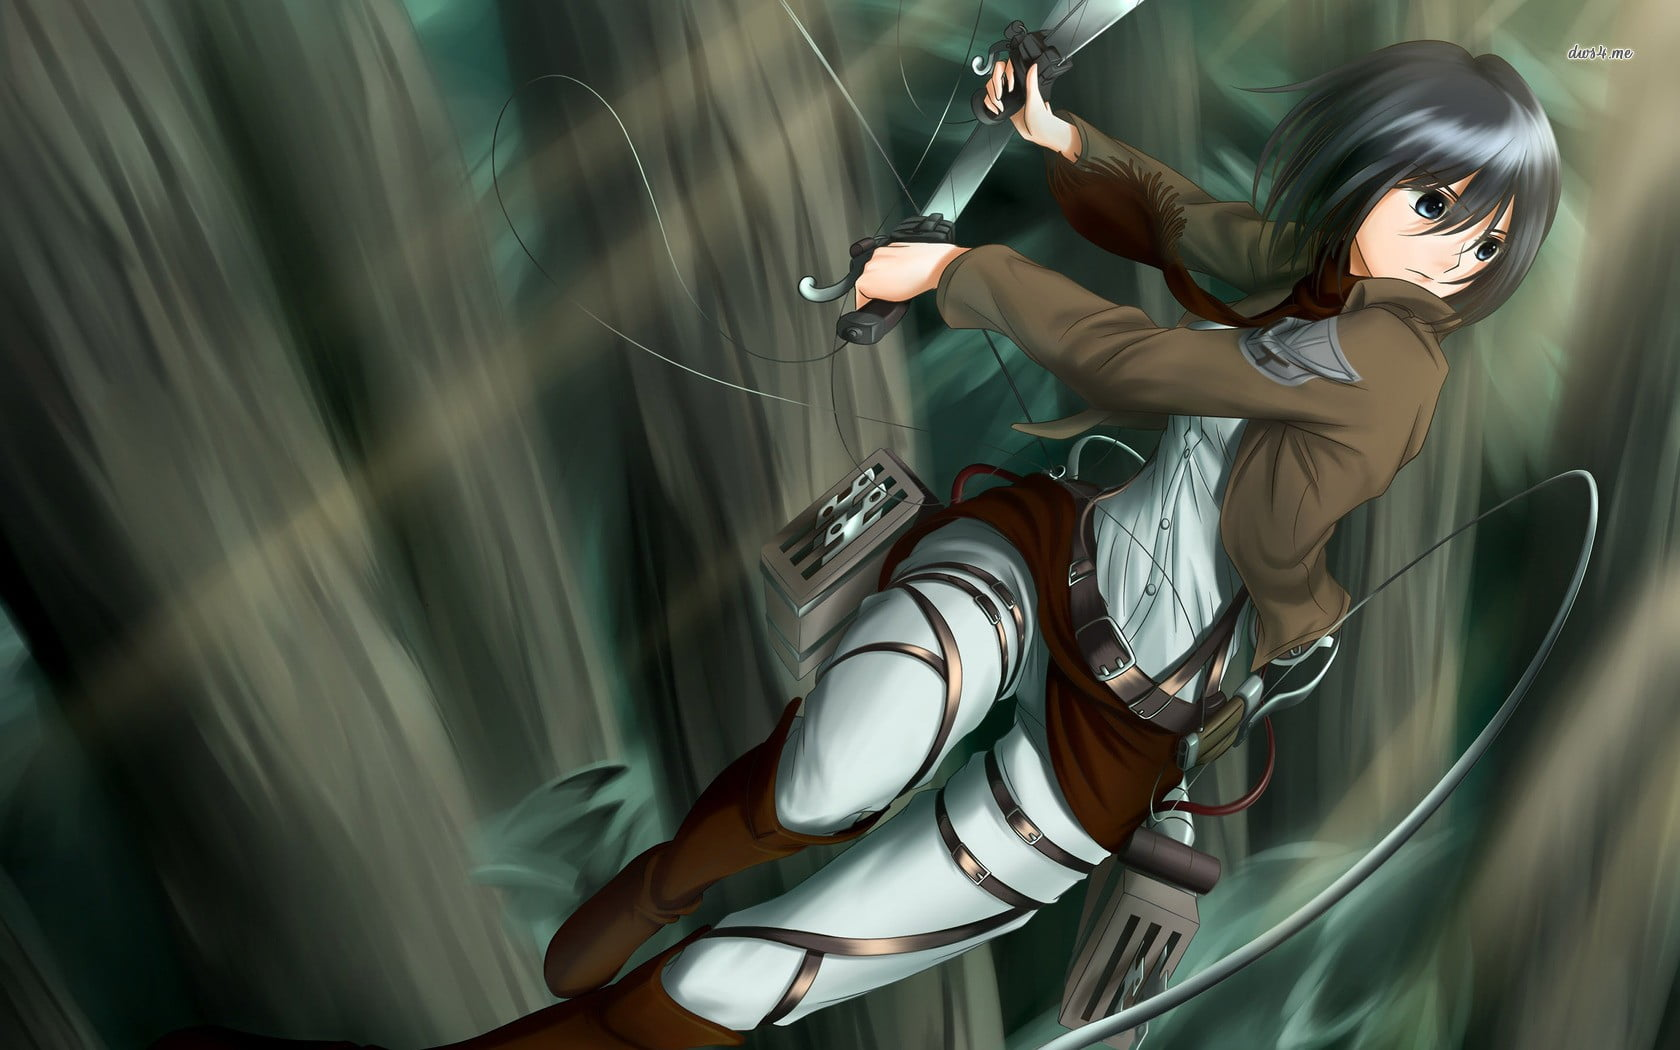 Attack On Titan Mikasa Wallpaper 1080p - HD Wallpaper